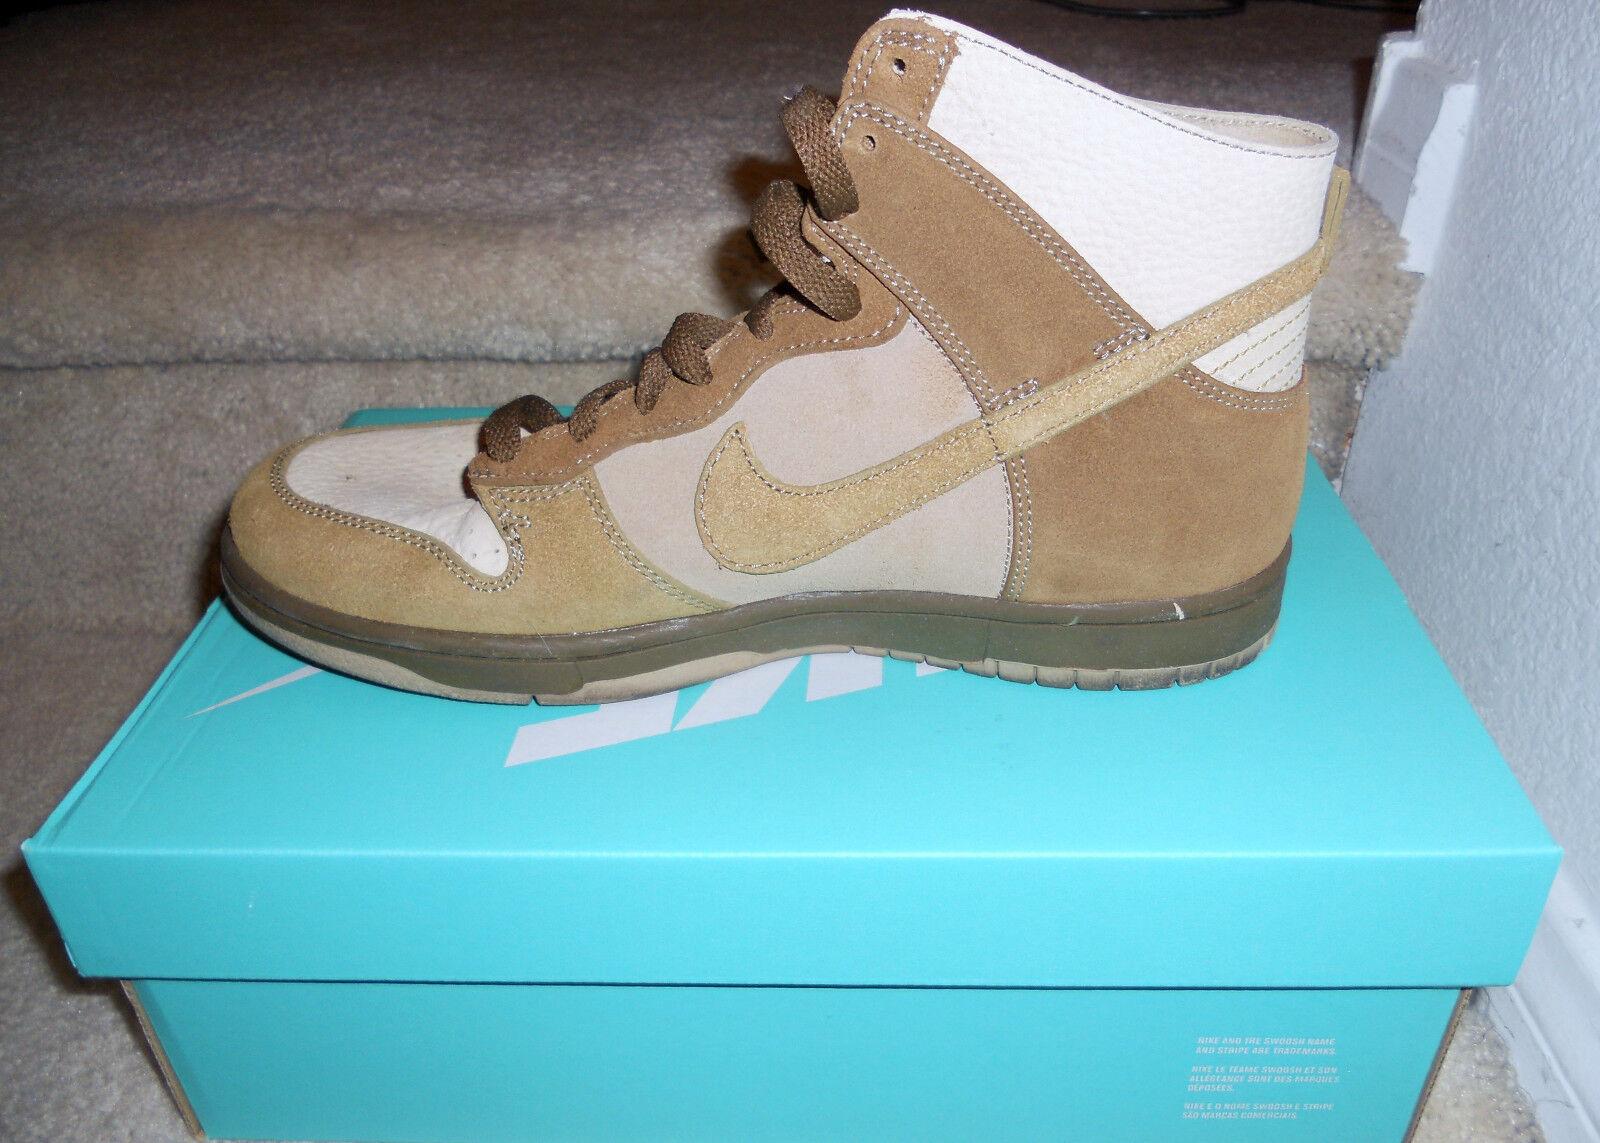 Nike Nike Nike dunk hohe 311296 131 us - größe 9,5 m / dummy - box 859100